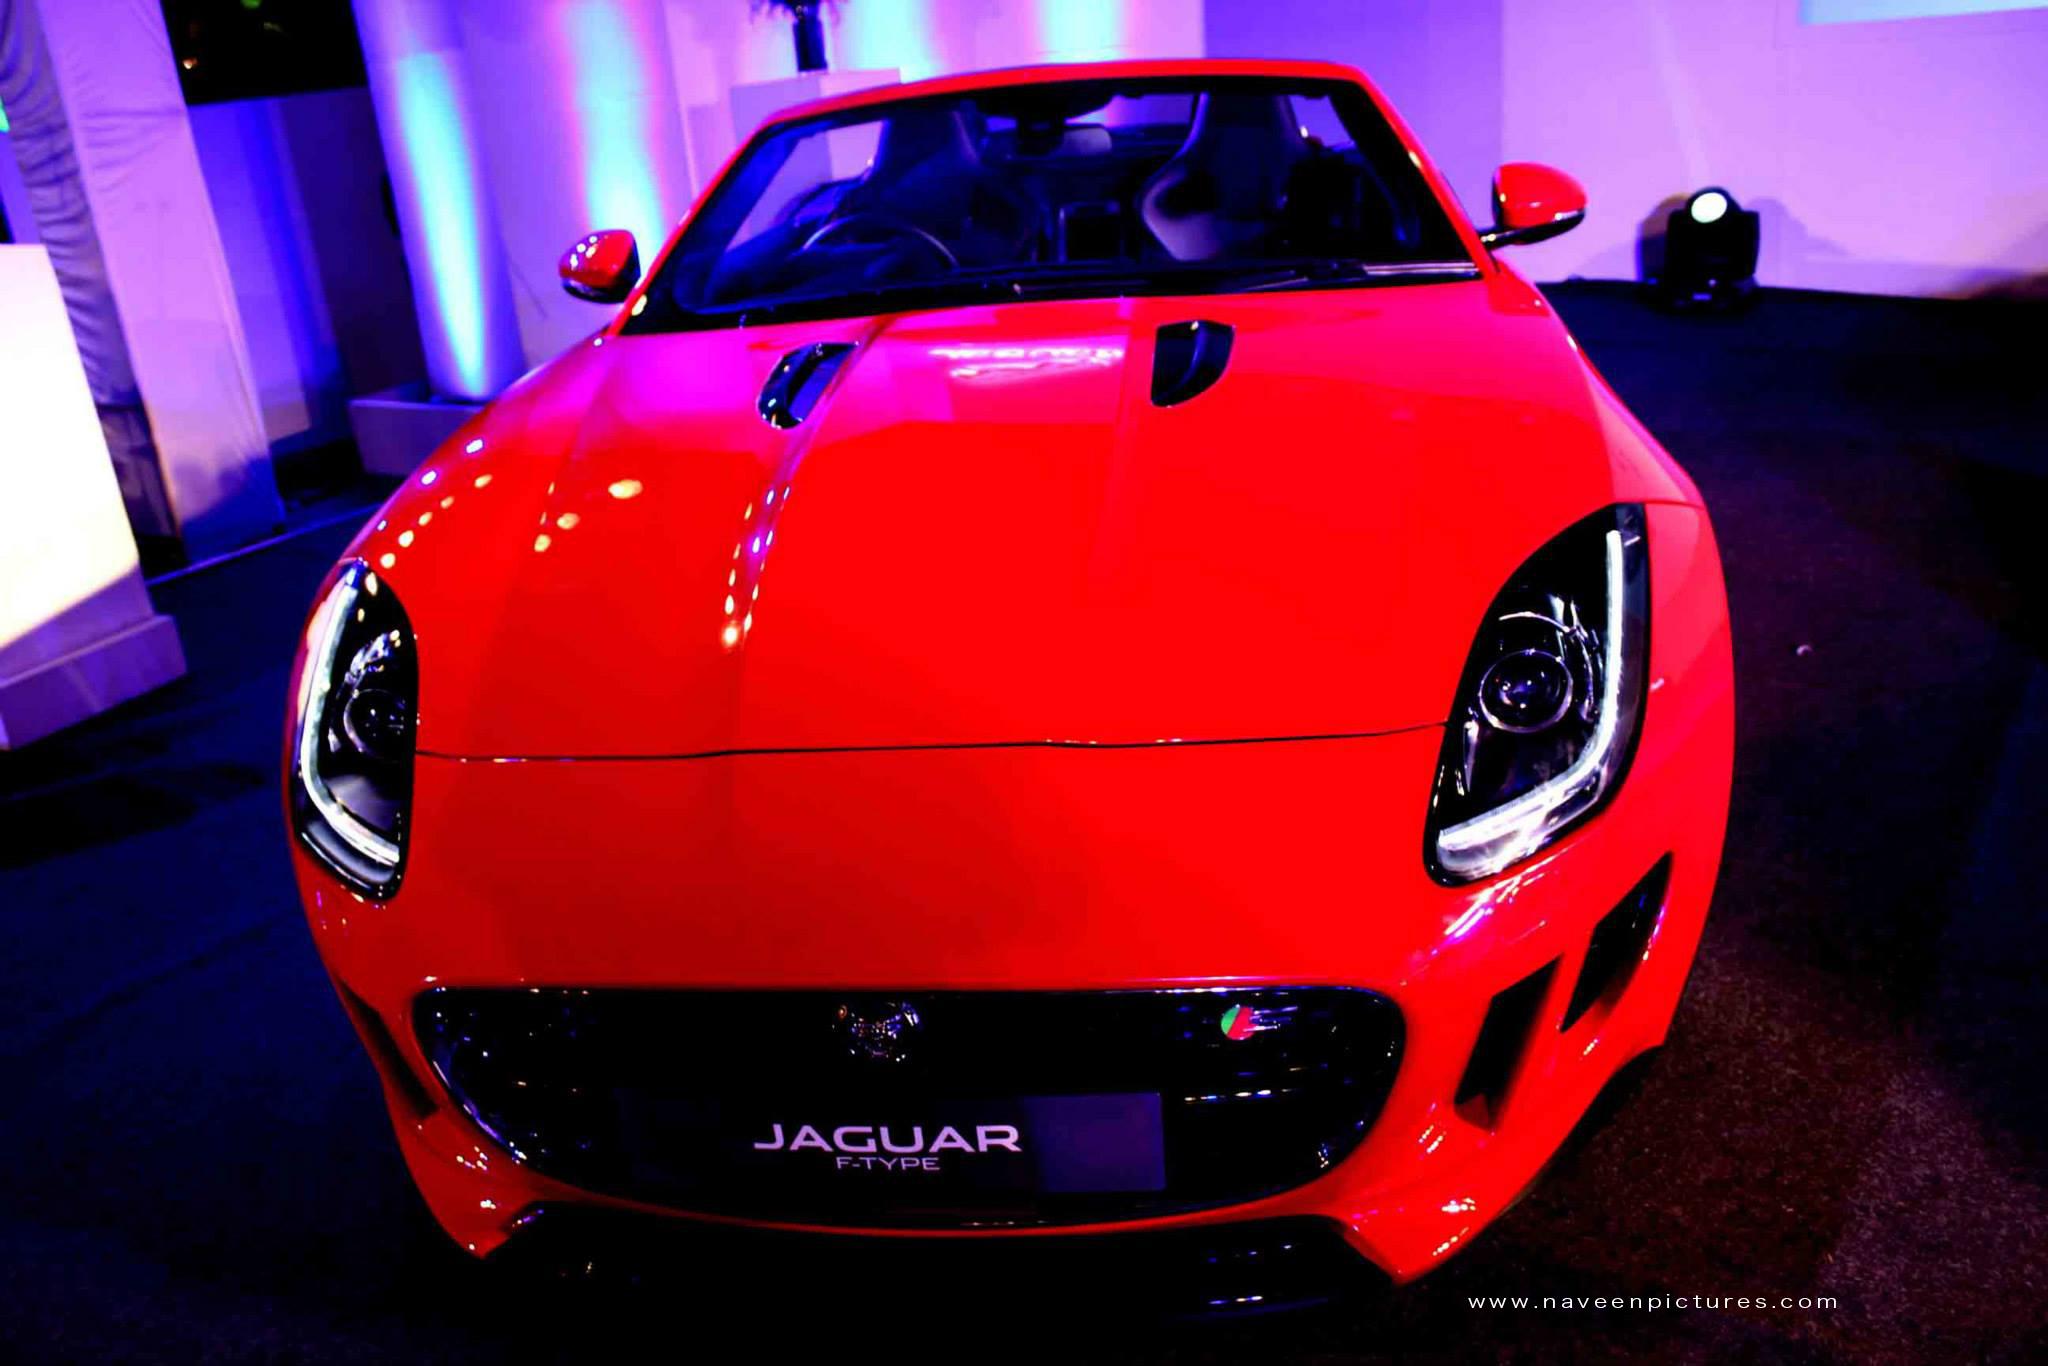 naveen picture event jaguar